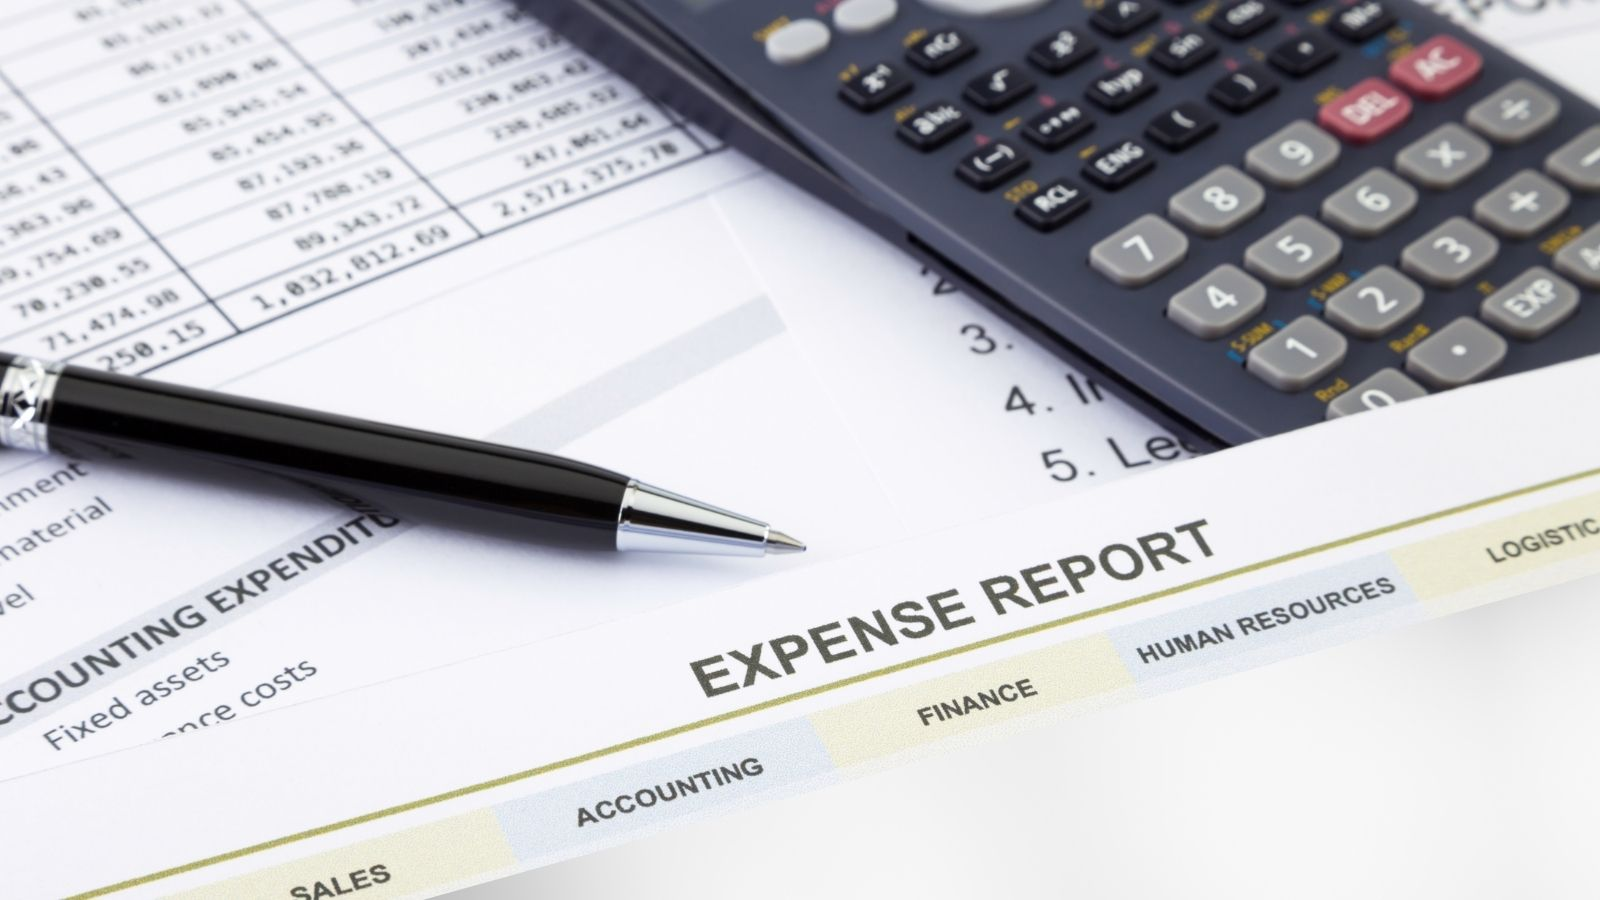 Fuel Cards UK: Fleet Expense Management